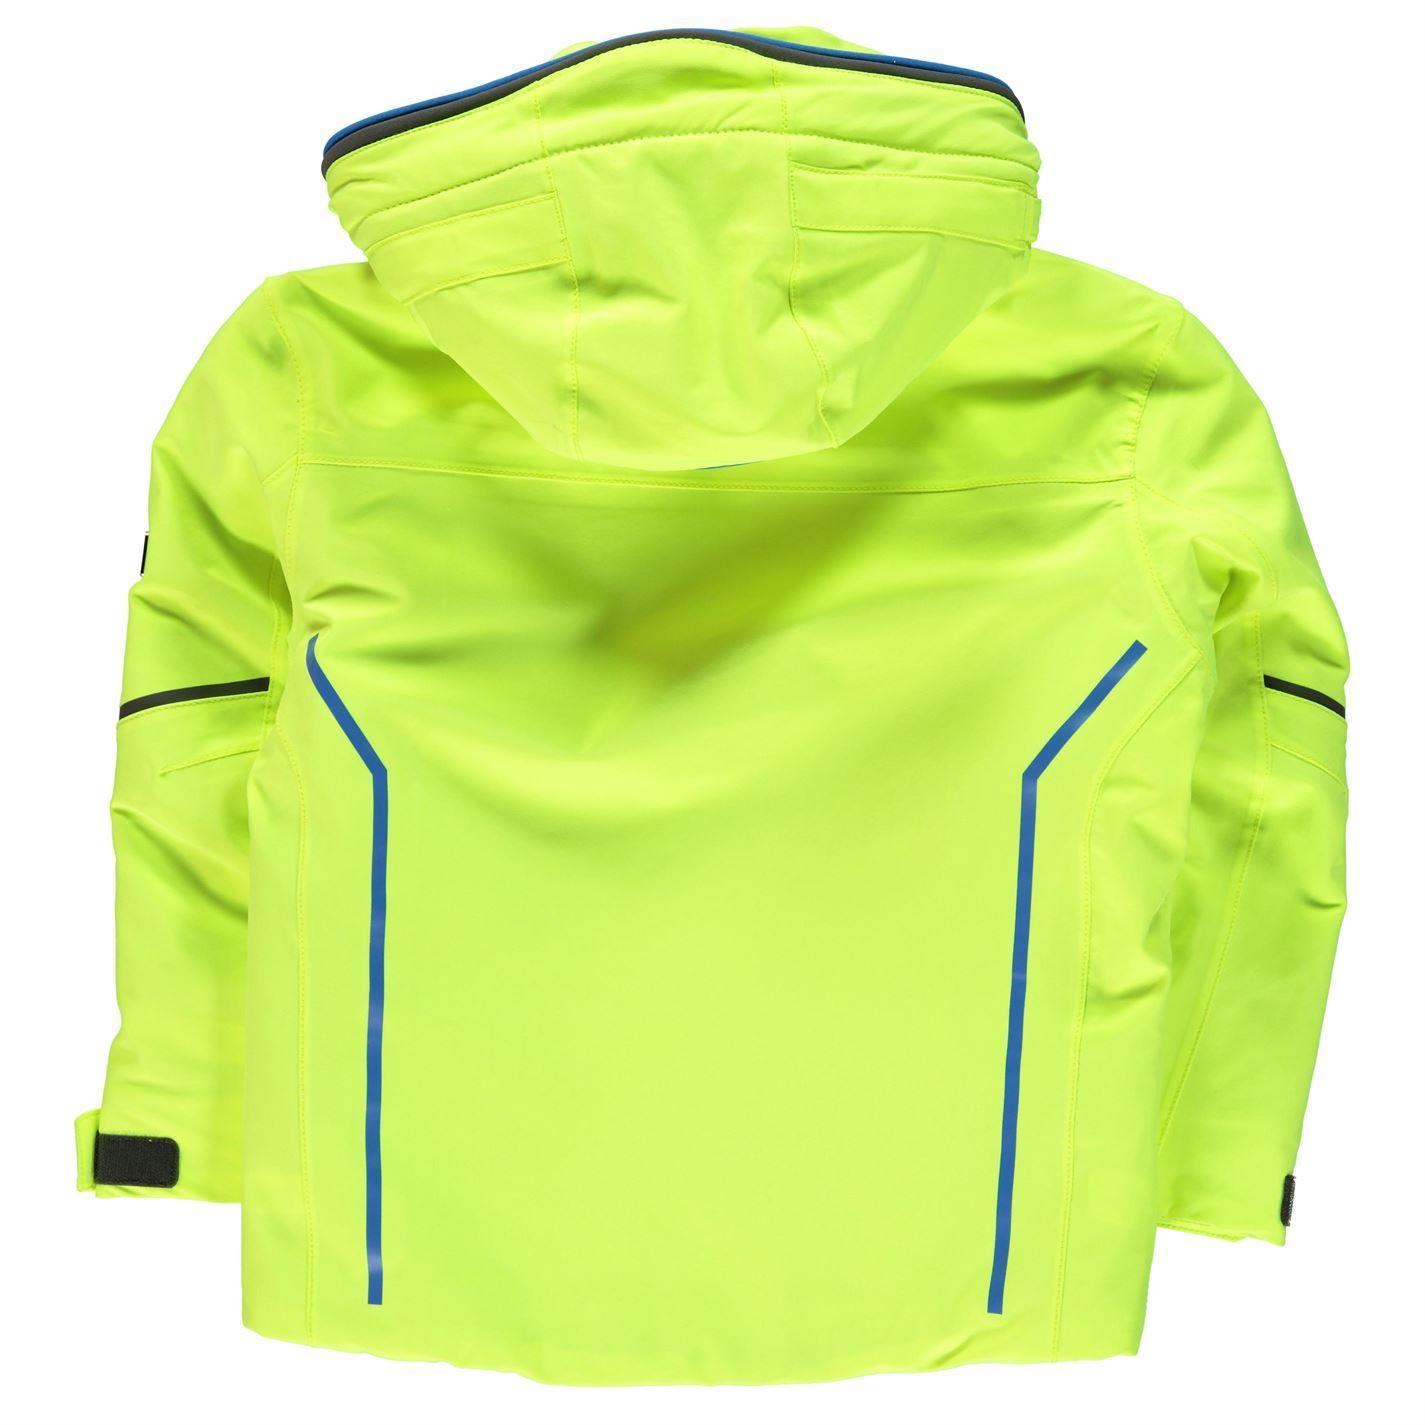 Nevica Gordon Jacket Junior Boys Yellow Snow Coat Skiing Outerwear ... 5a35290c458